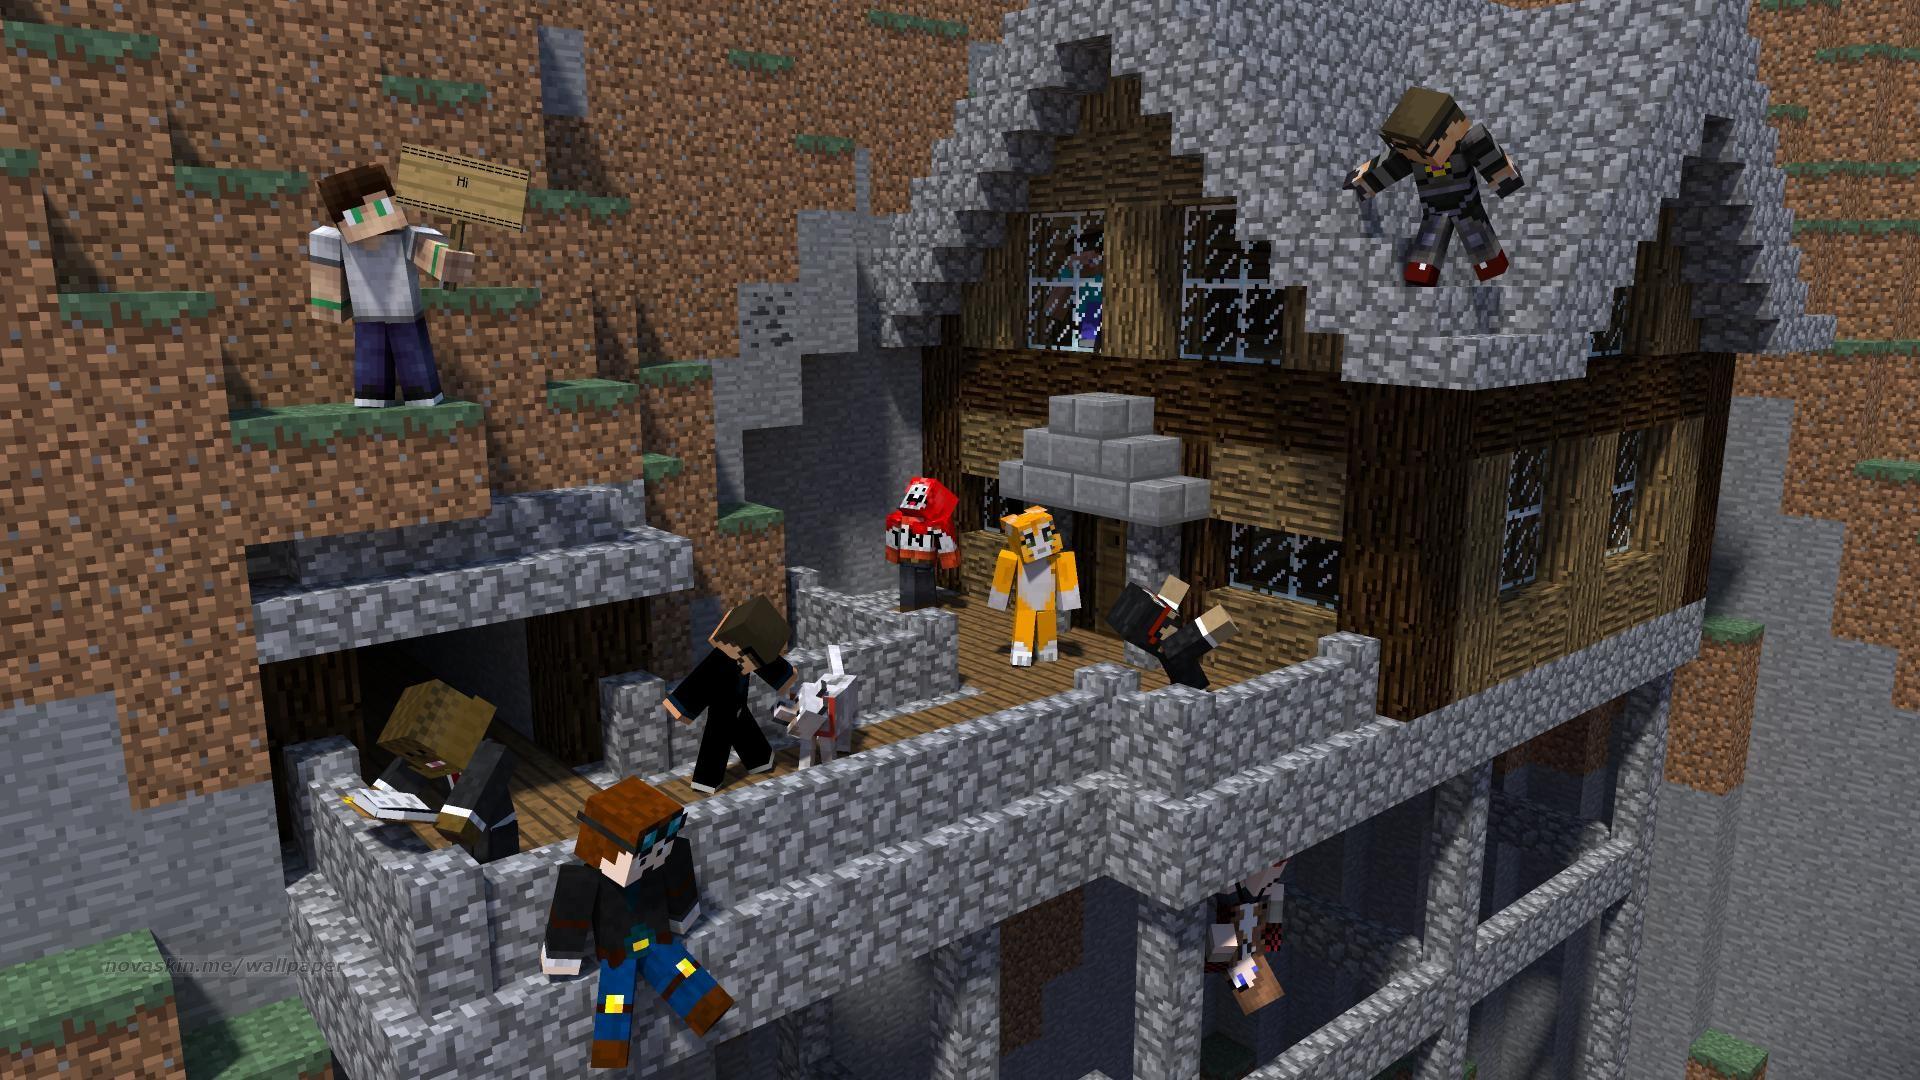 Minecraft Wallpaper Pictures 1